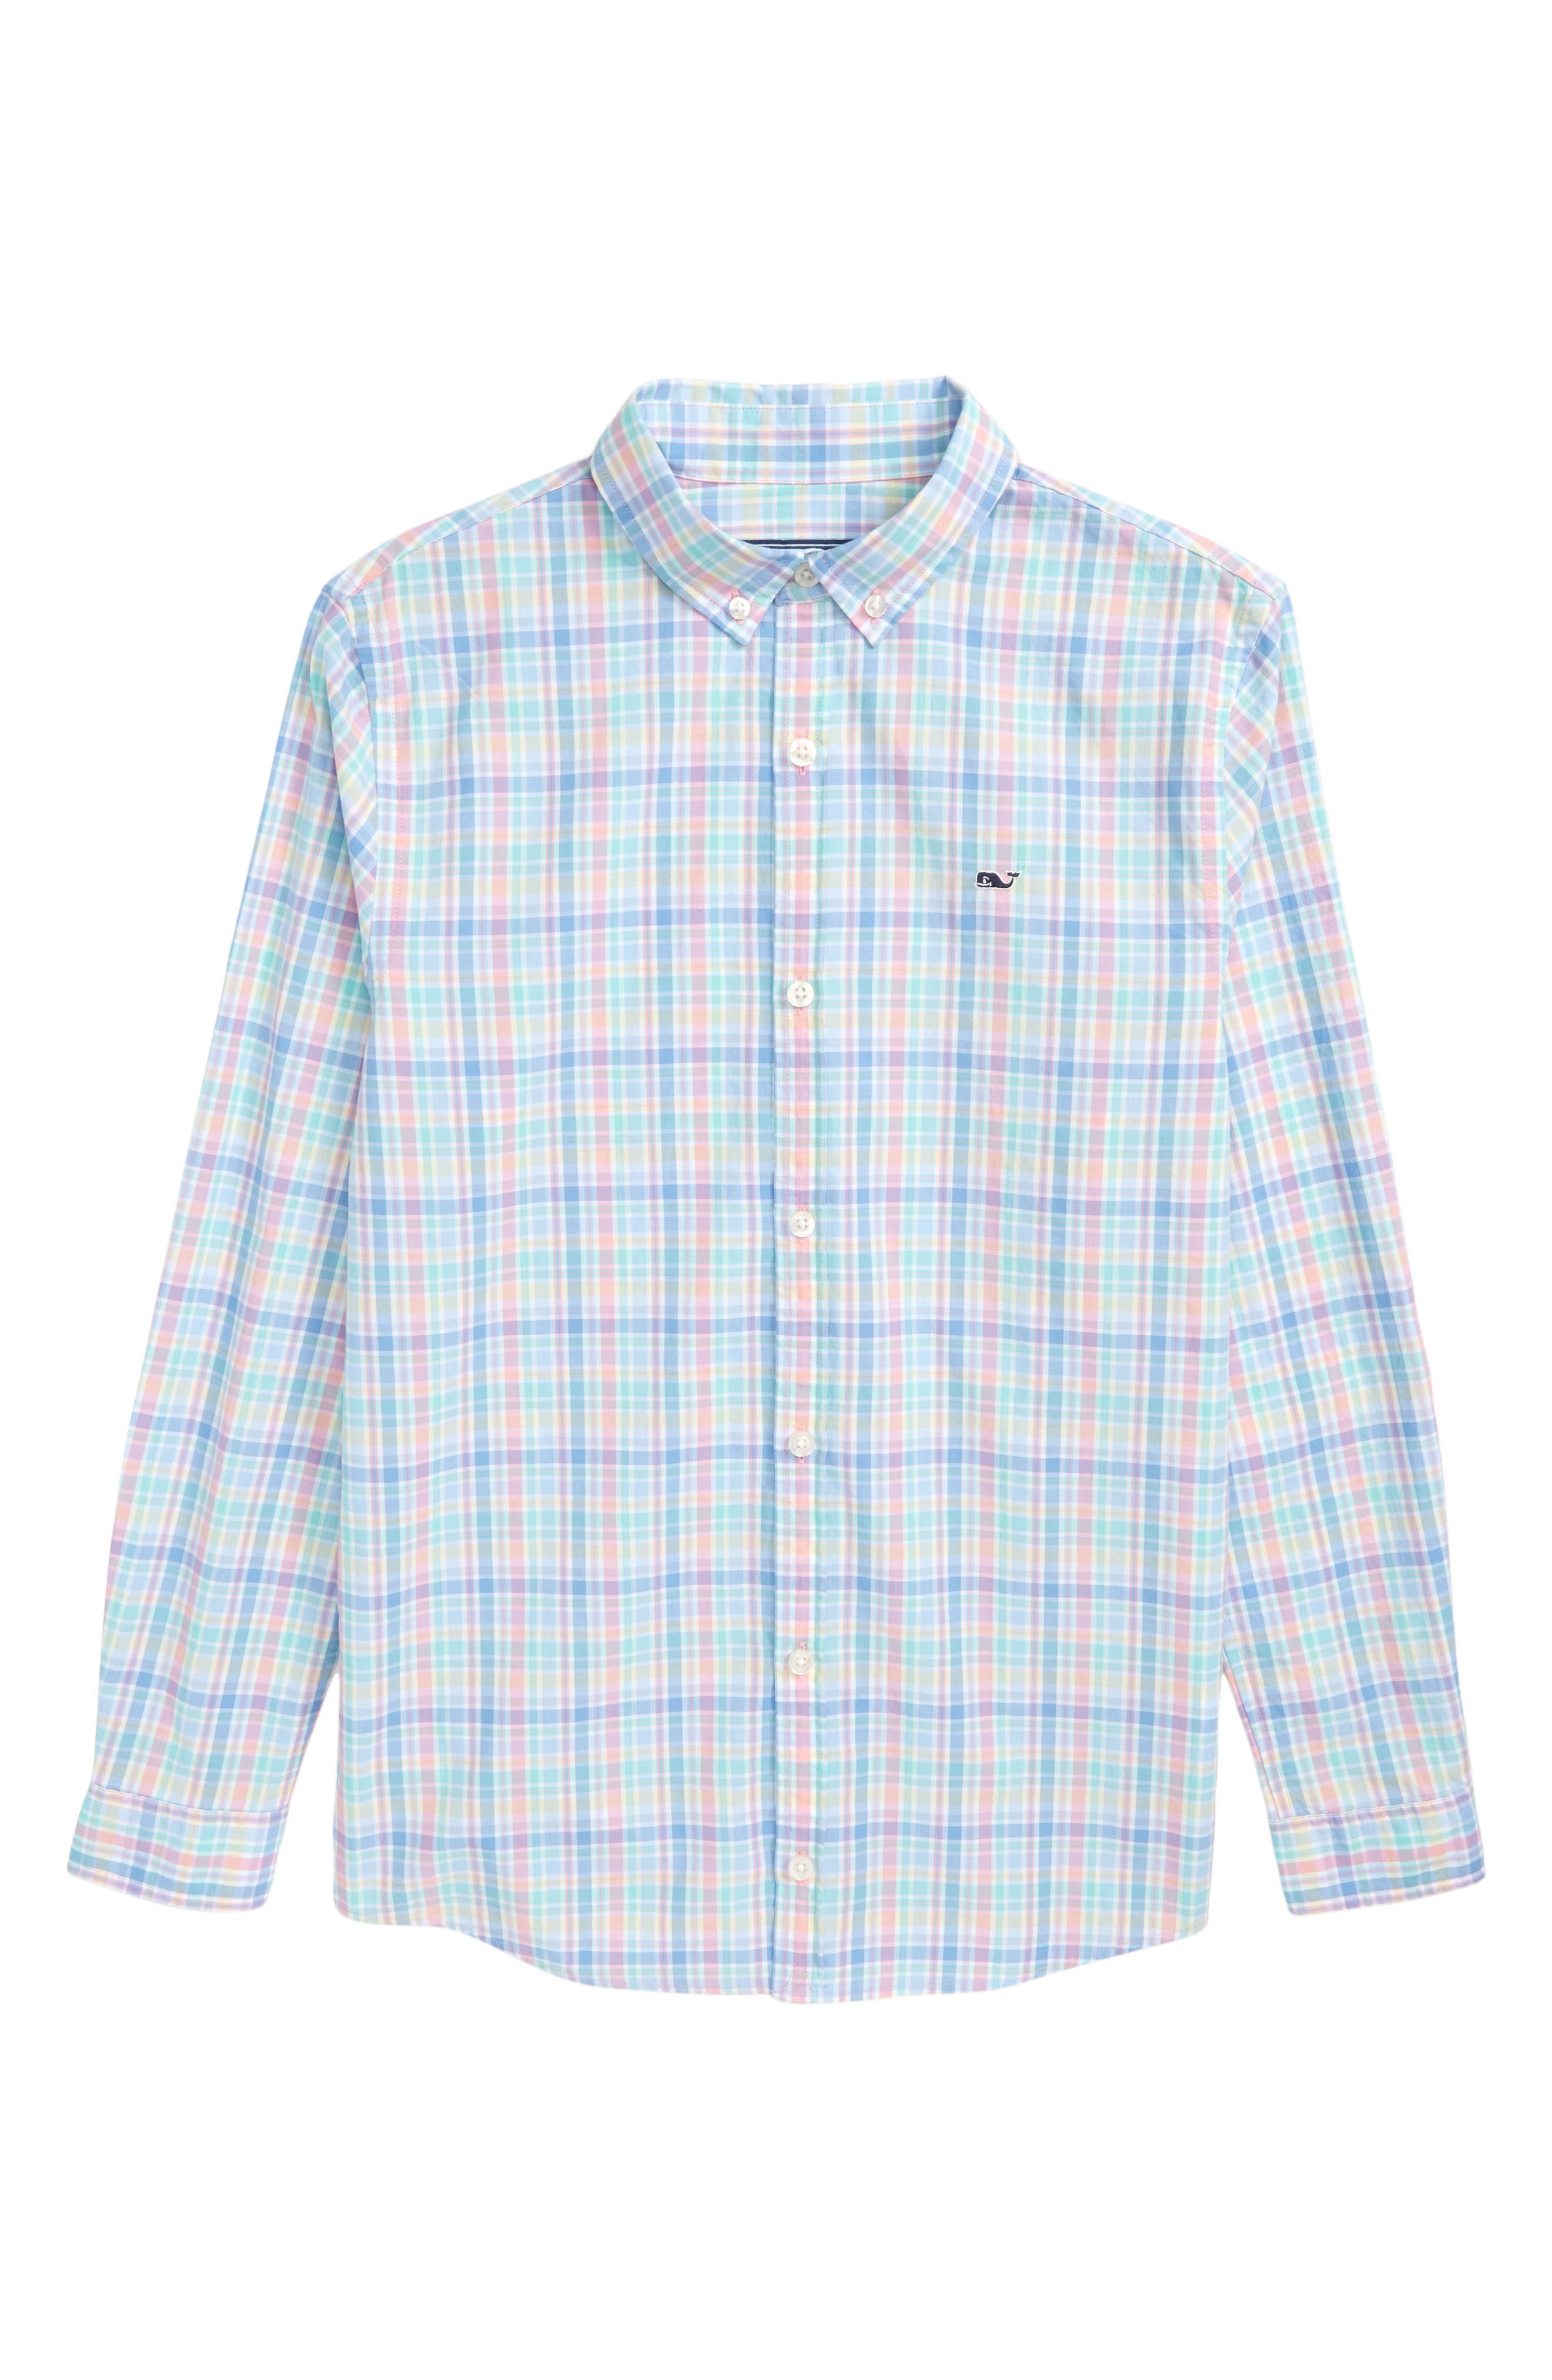 Walker's Cay Plaid Woven Shirt,                             Main thumbnail 1, color,                             Jake Blue